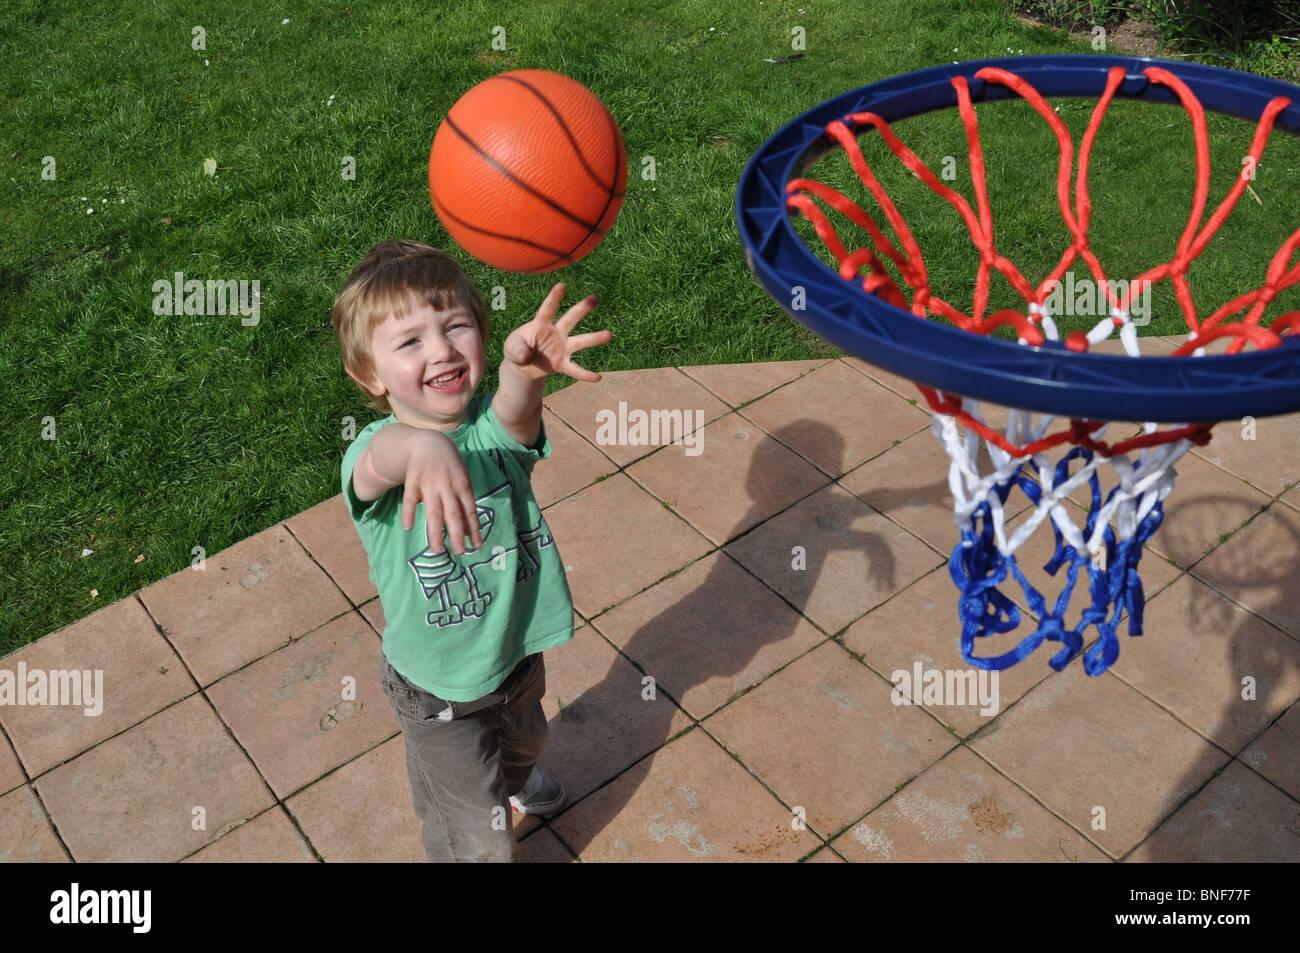 Boy playing basketball - Stock Image